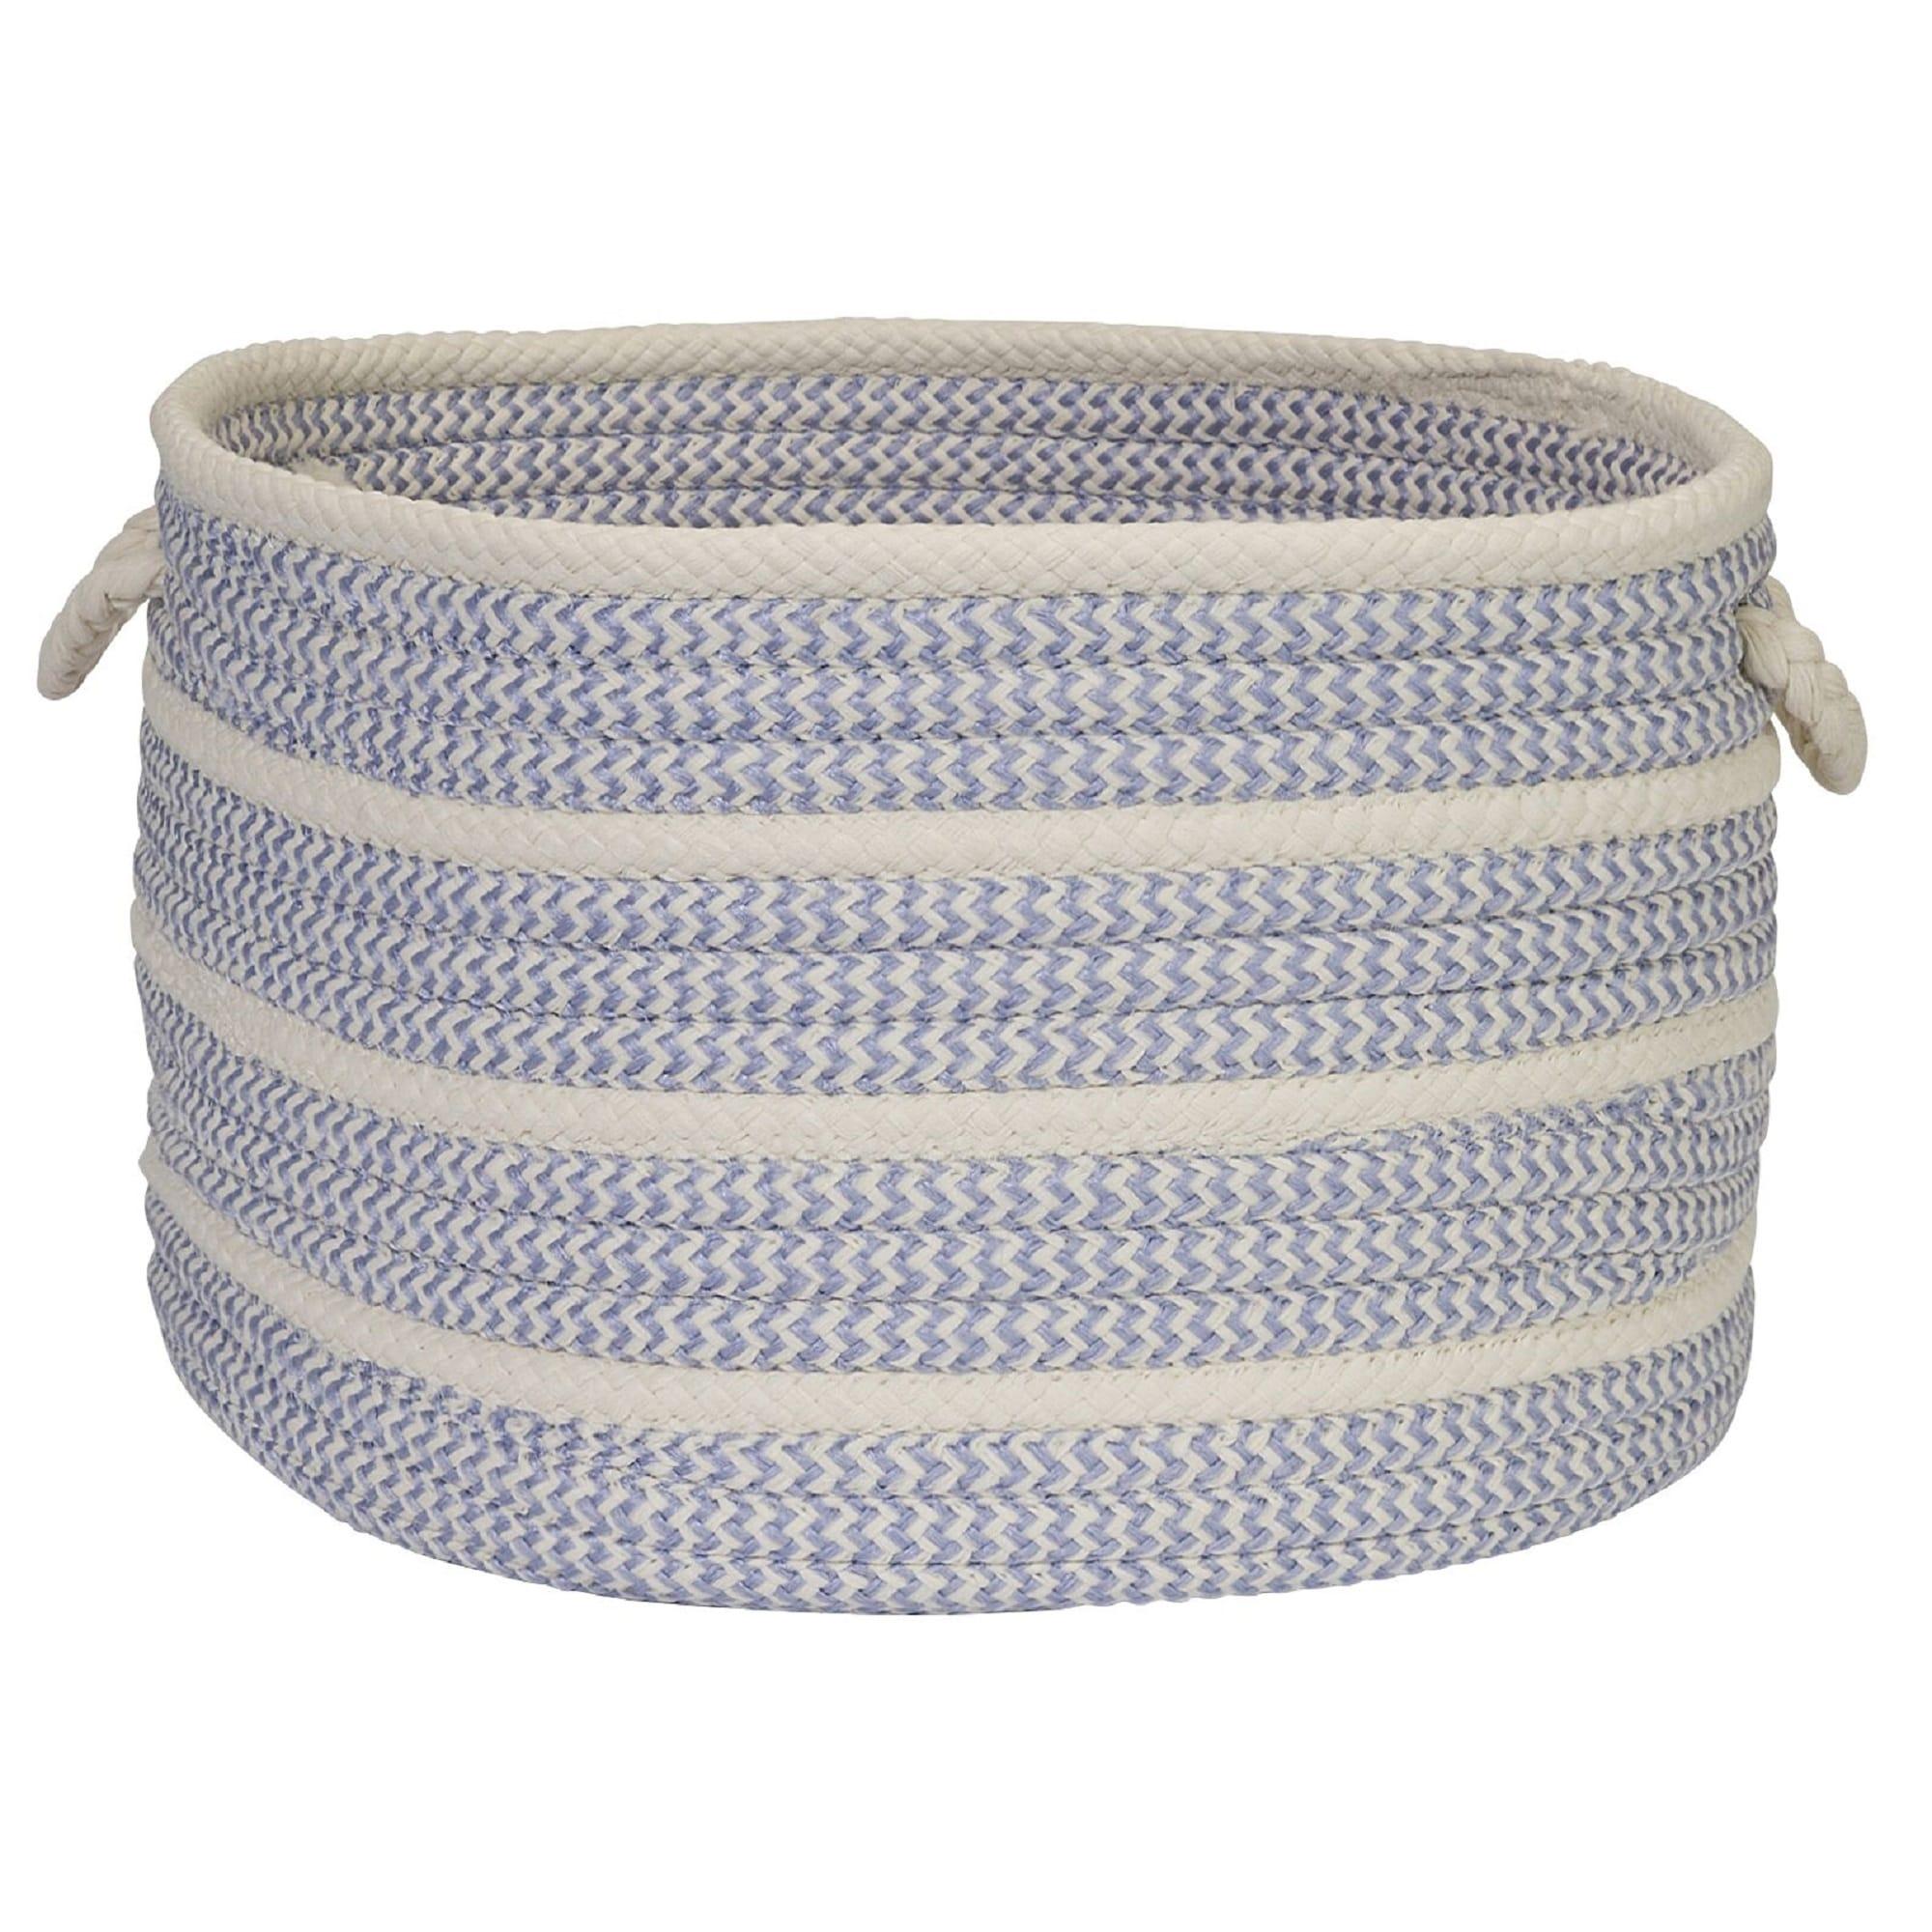 14 Amethyst Purple Farmhouse Style Round Braided Storage Basket Overstock 32297437